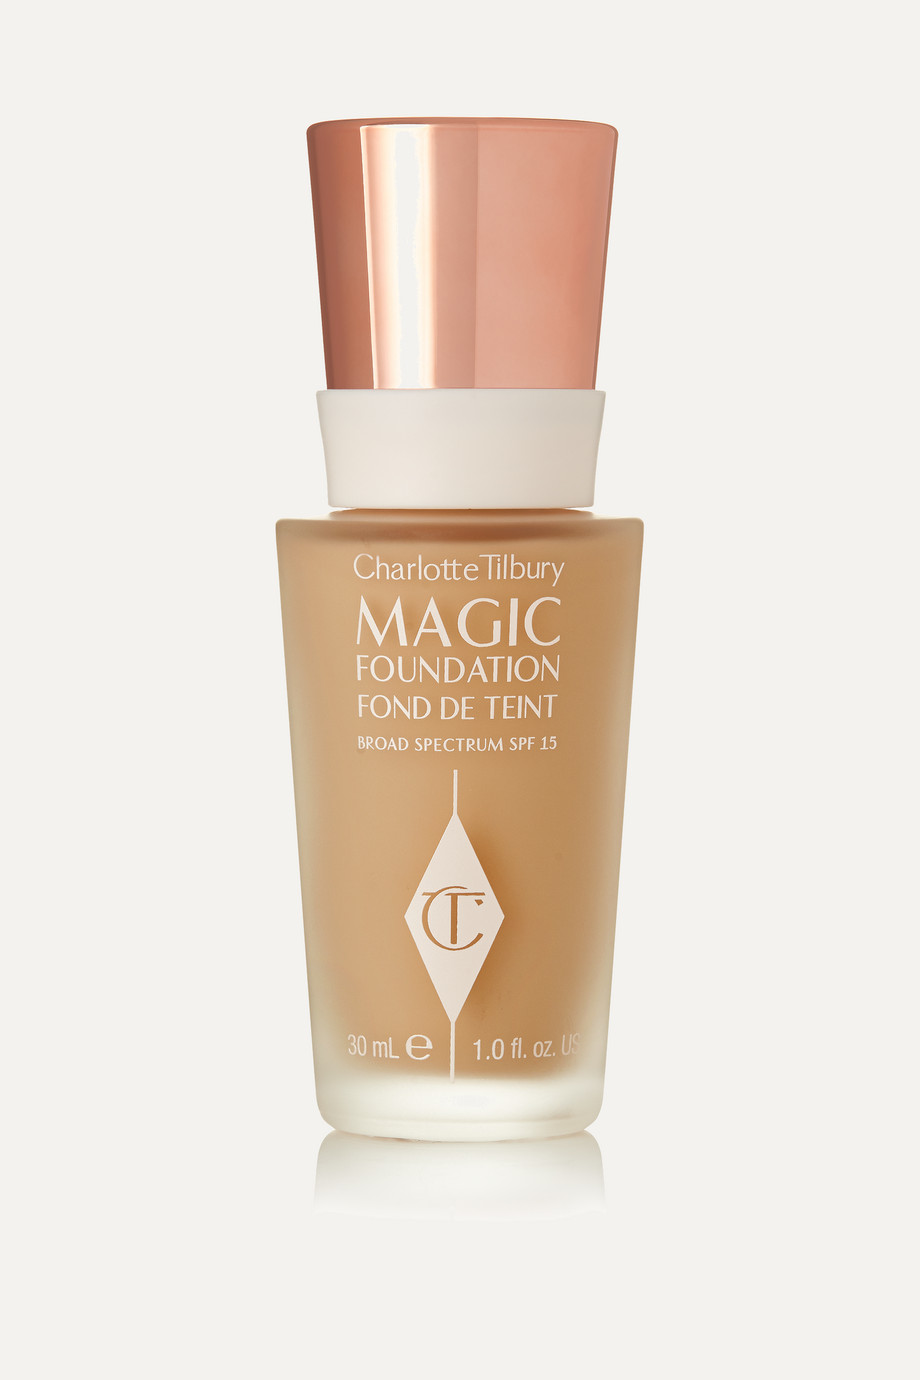 Charlotte Tilbury Magic Foundation Flawless Long-Lasting Coverage SPF15 - Shade 5, 30ml